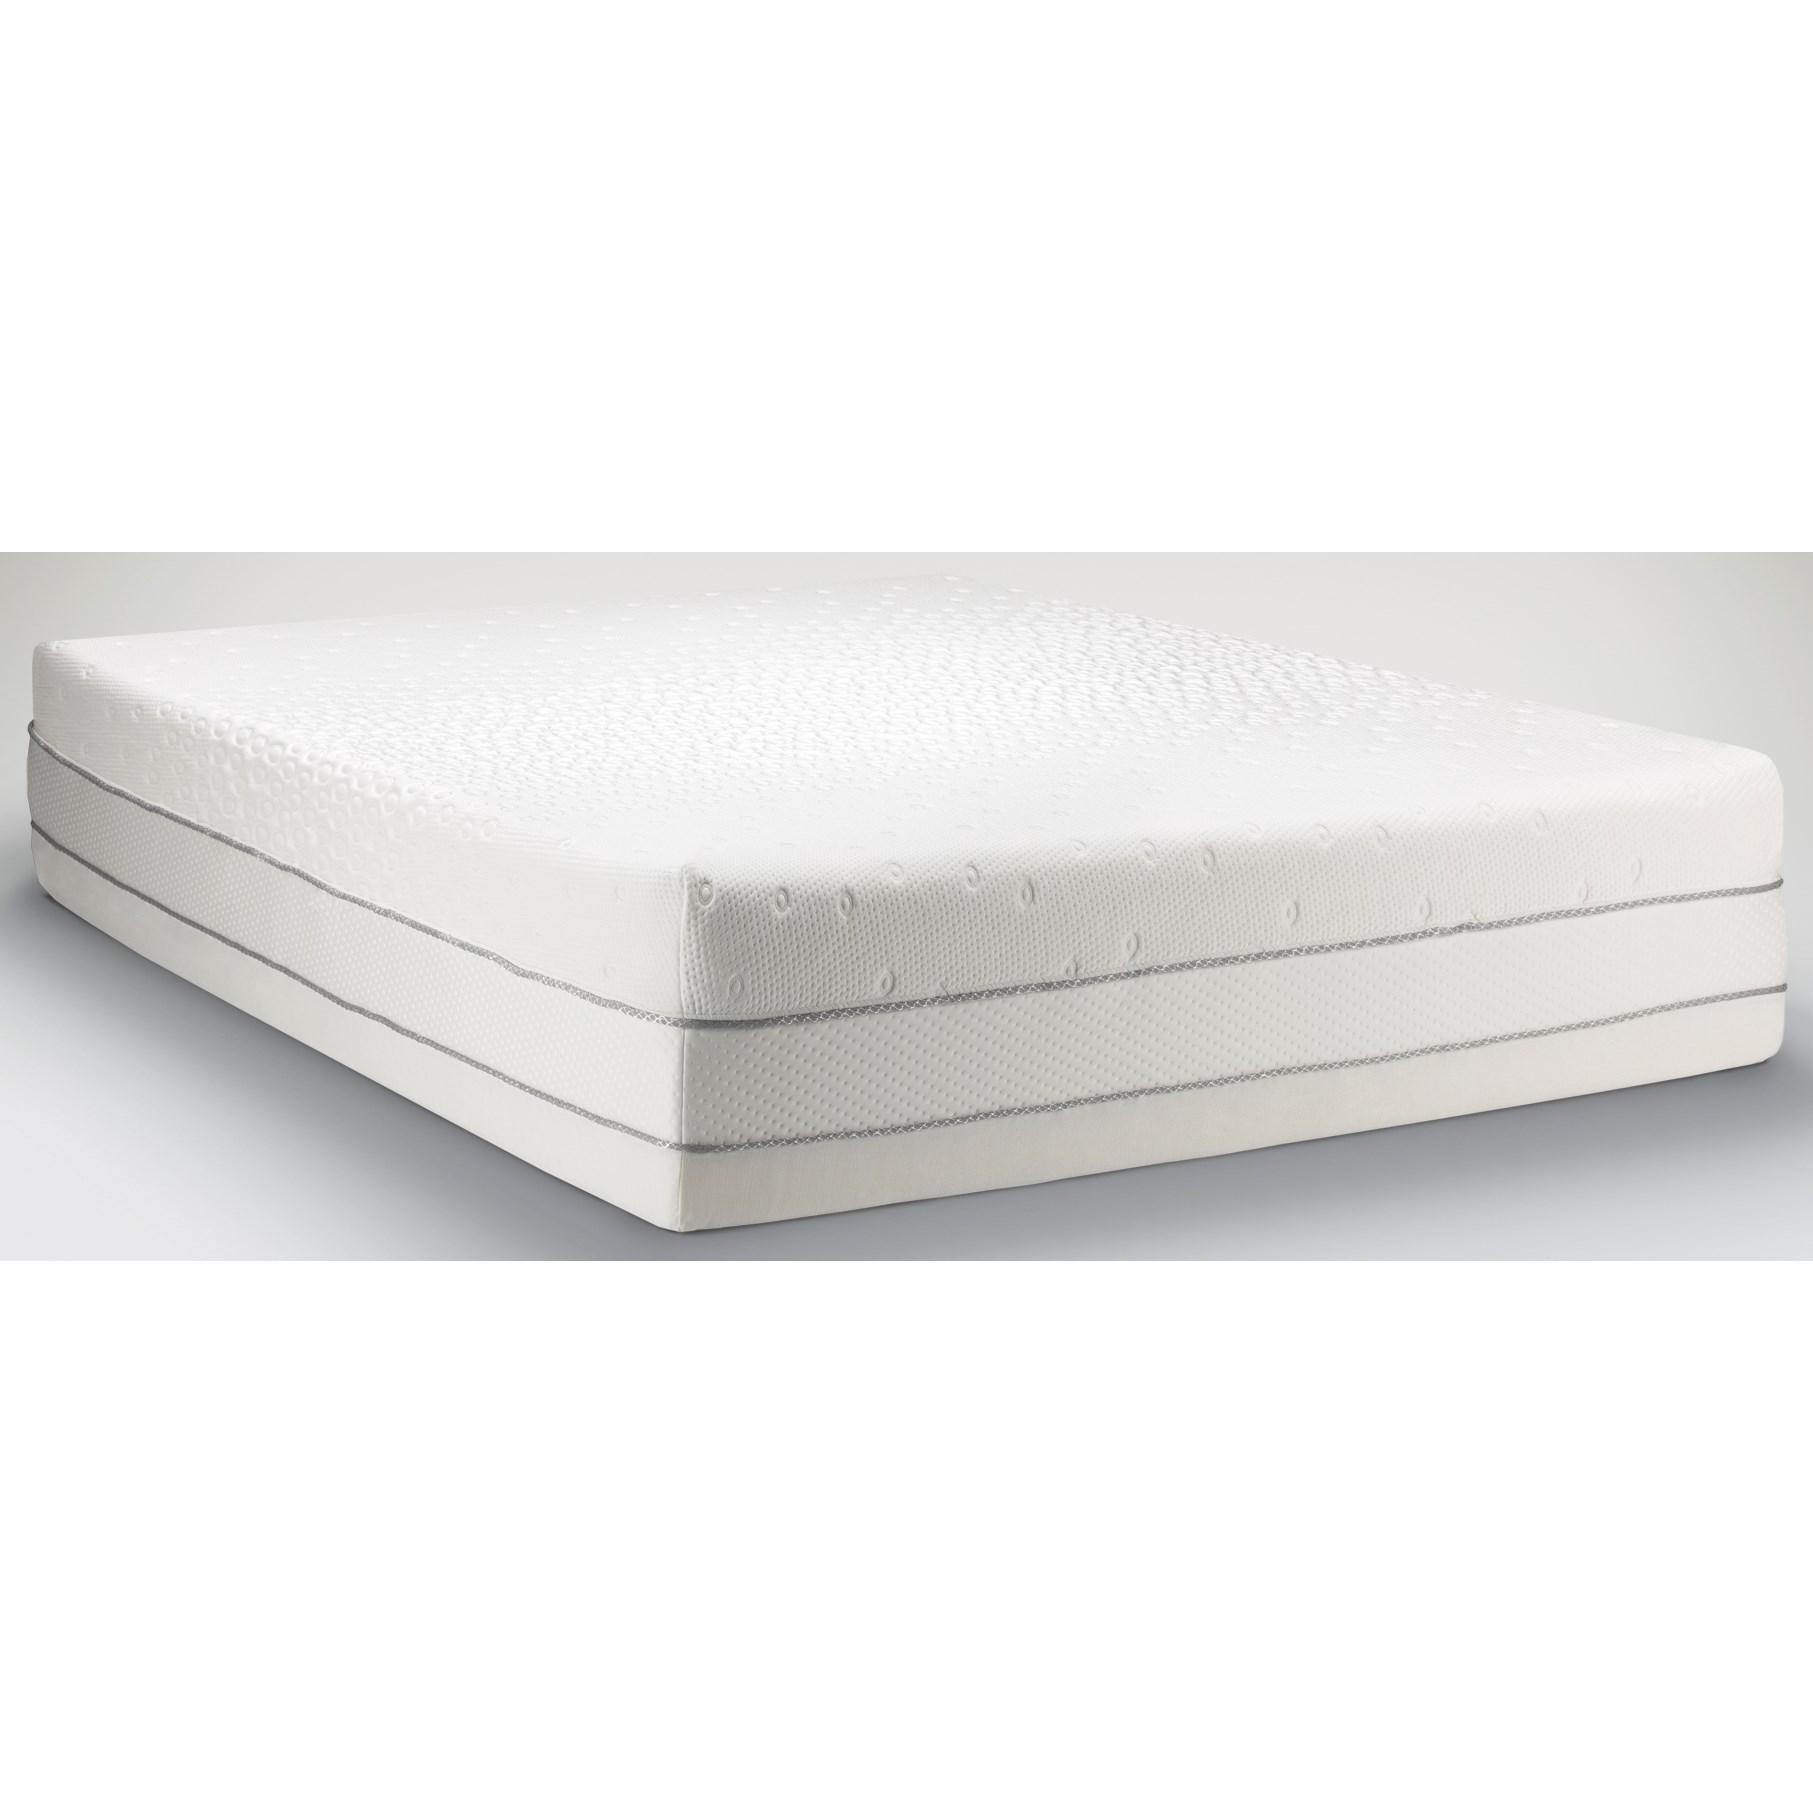 Tempur-Pedic® TEMPUR-Choice™  Luxe Queen Medium Firm to Soft Mattress  - Item Number: 10112150